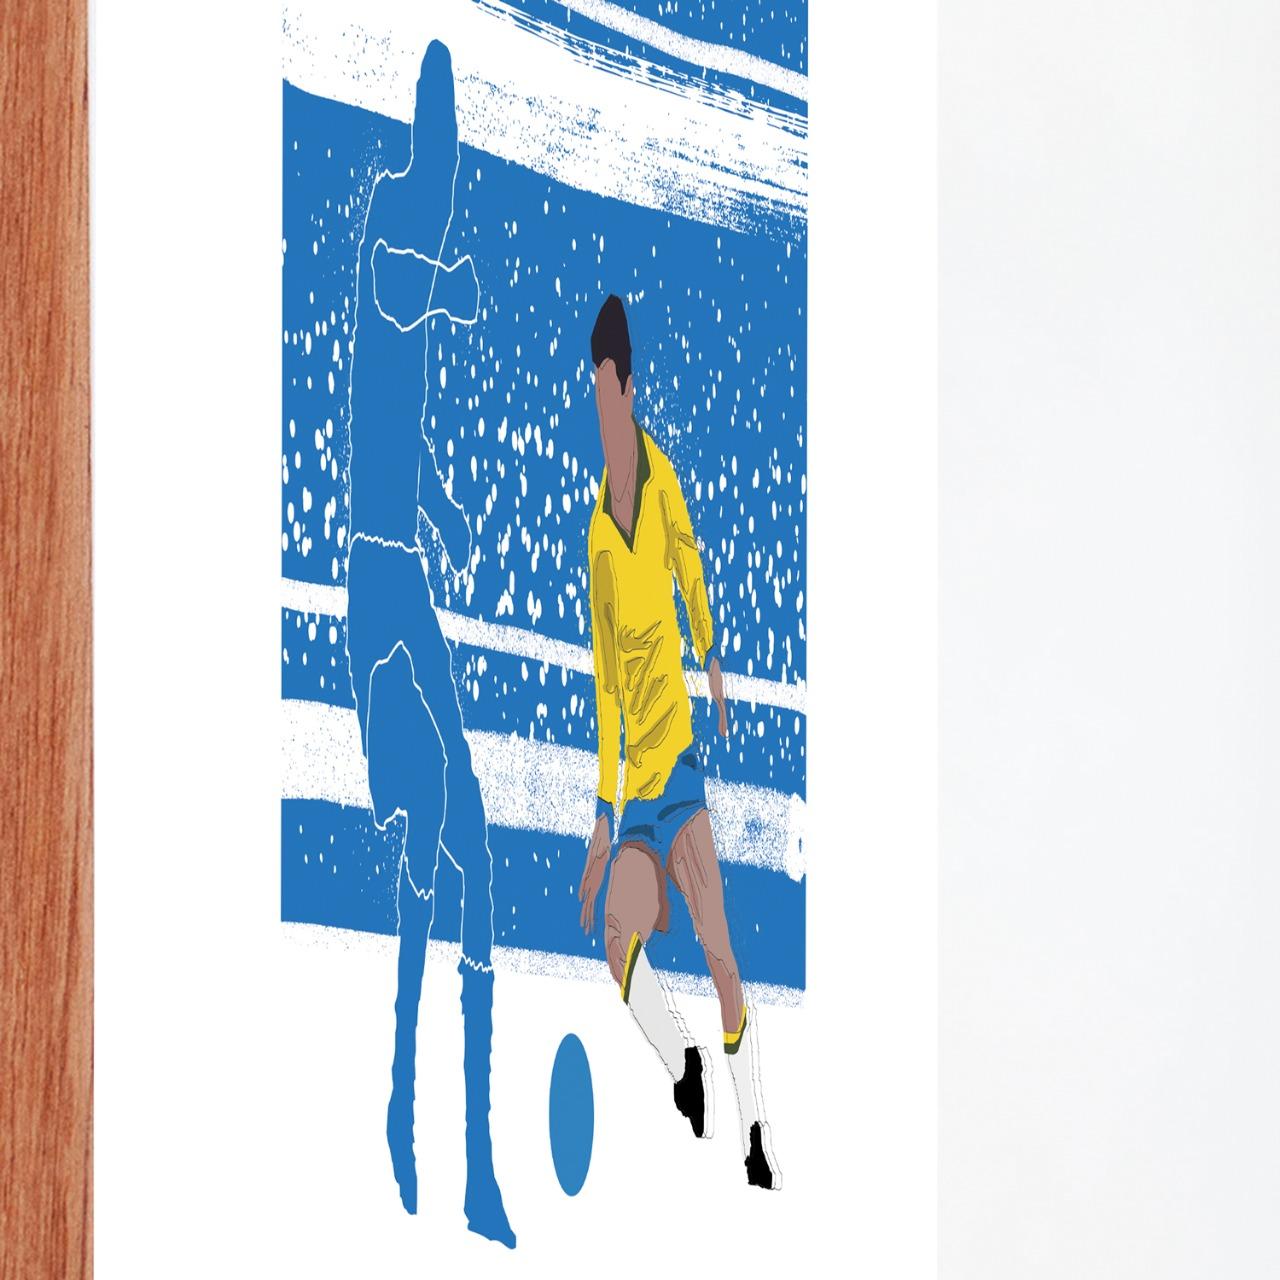 """Mané Garrincha"""